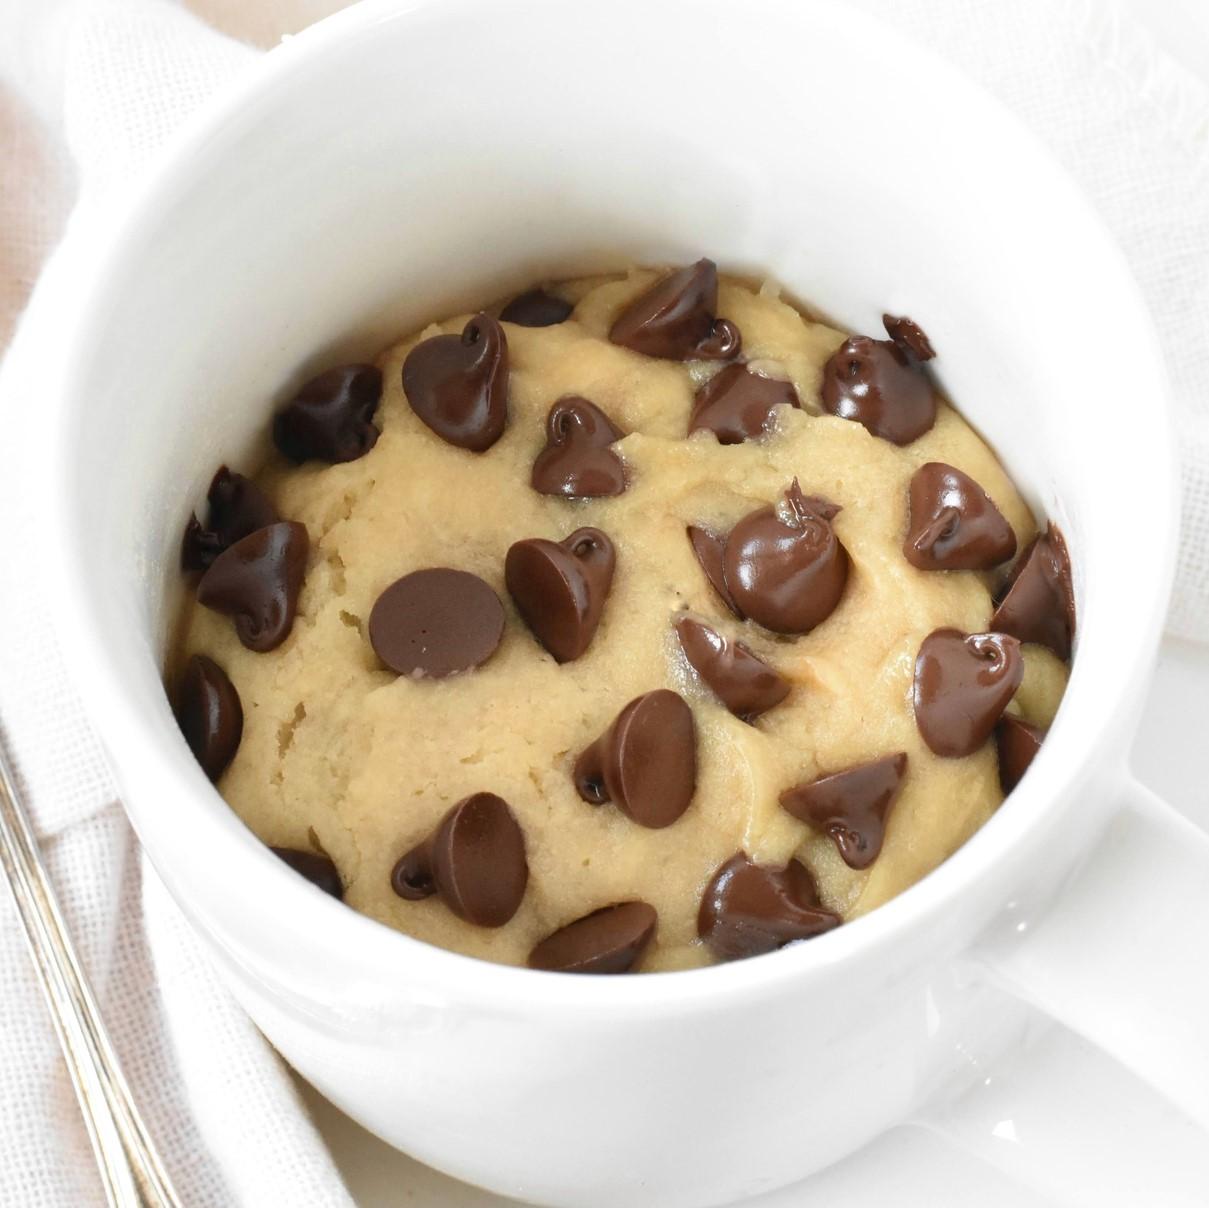 1 Minute Chocolate Chip Mug Cookie No Egg Baking Envy